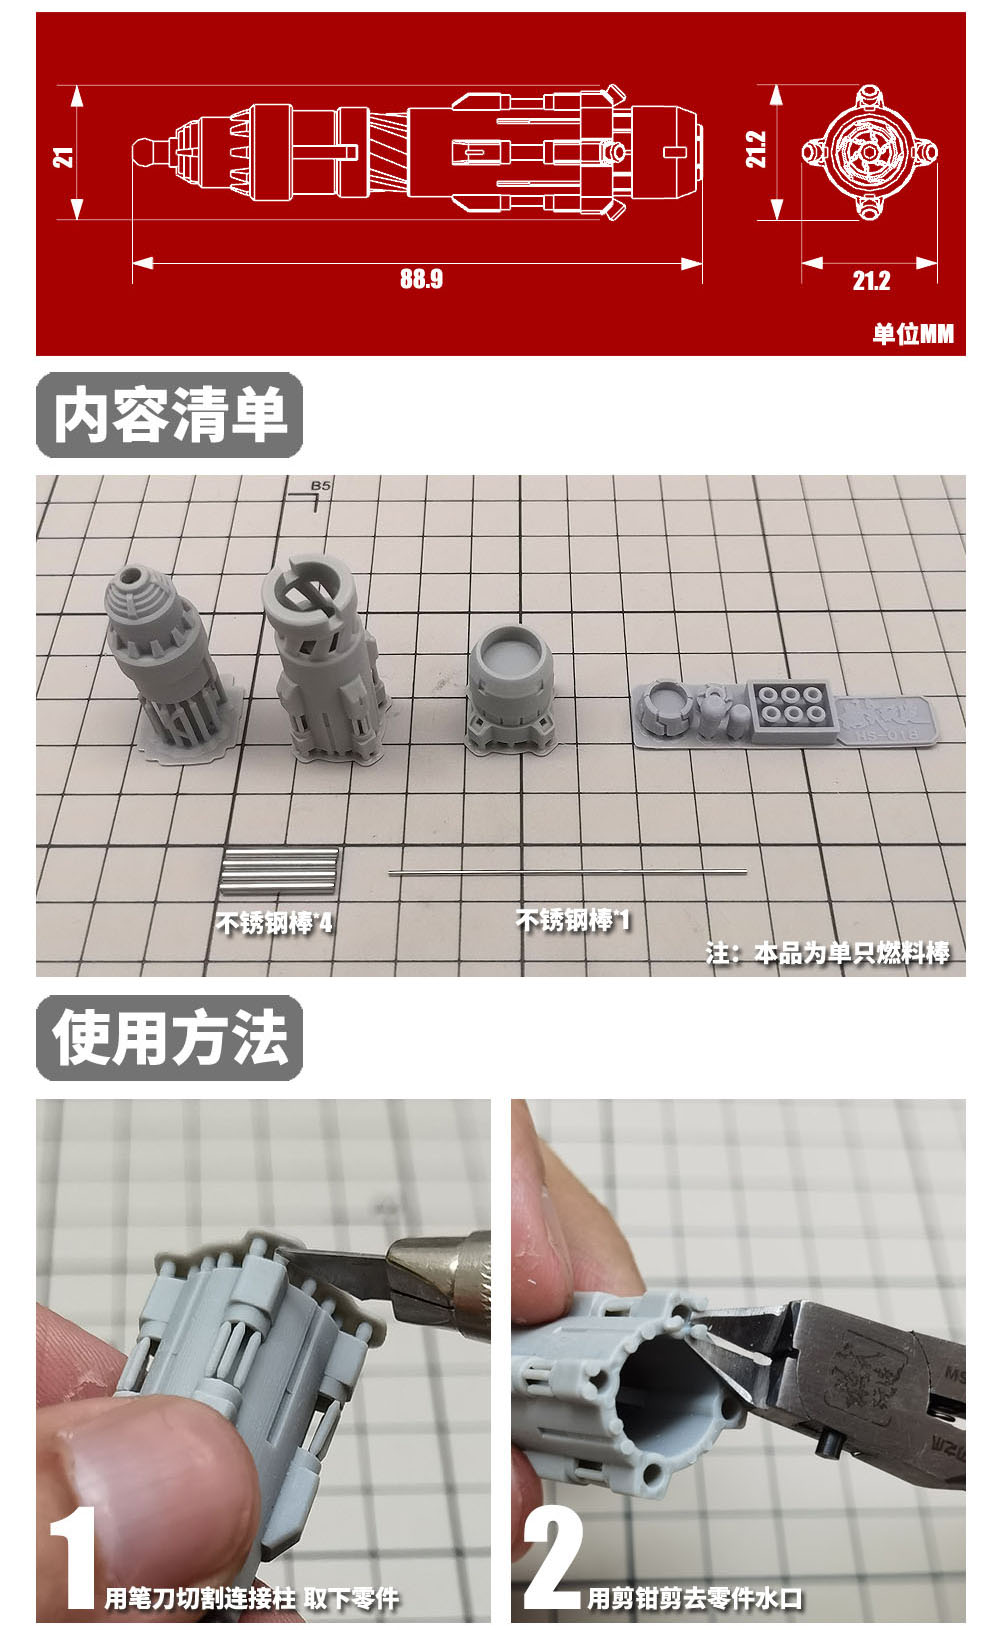 G829_HS018RG_Propeller_tank_004.jpg